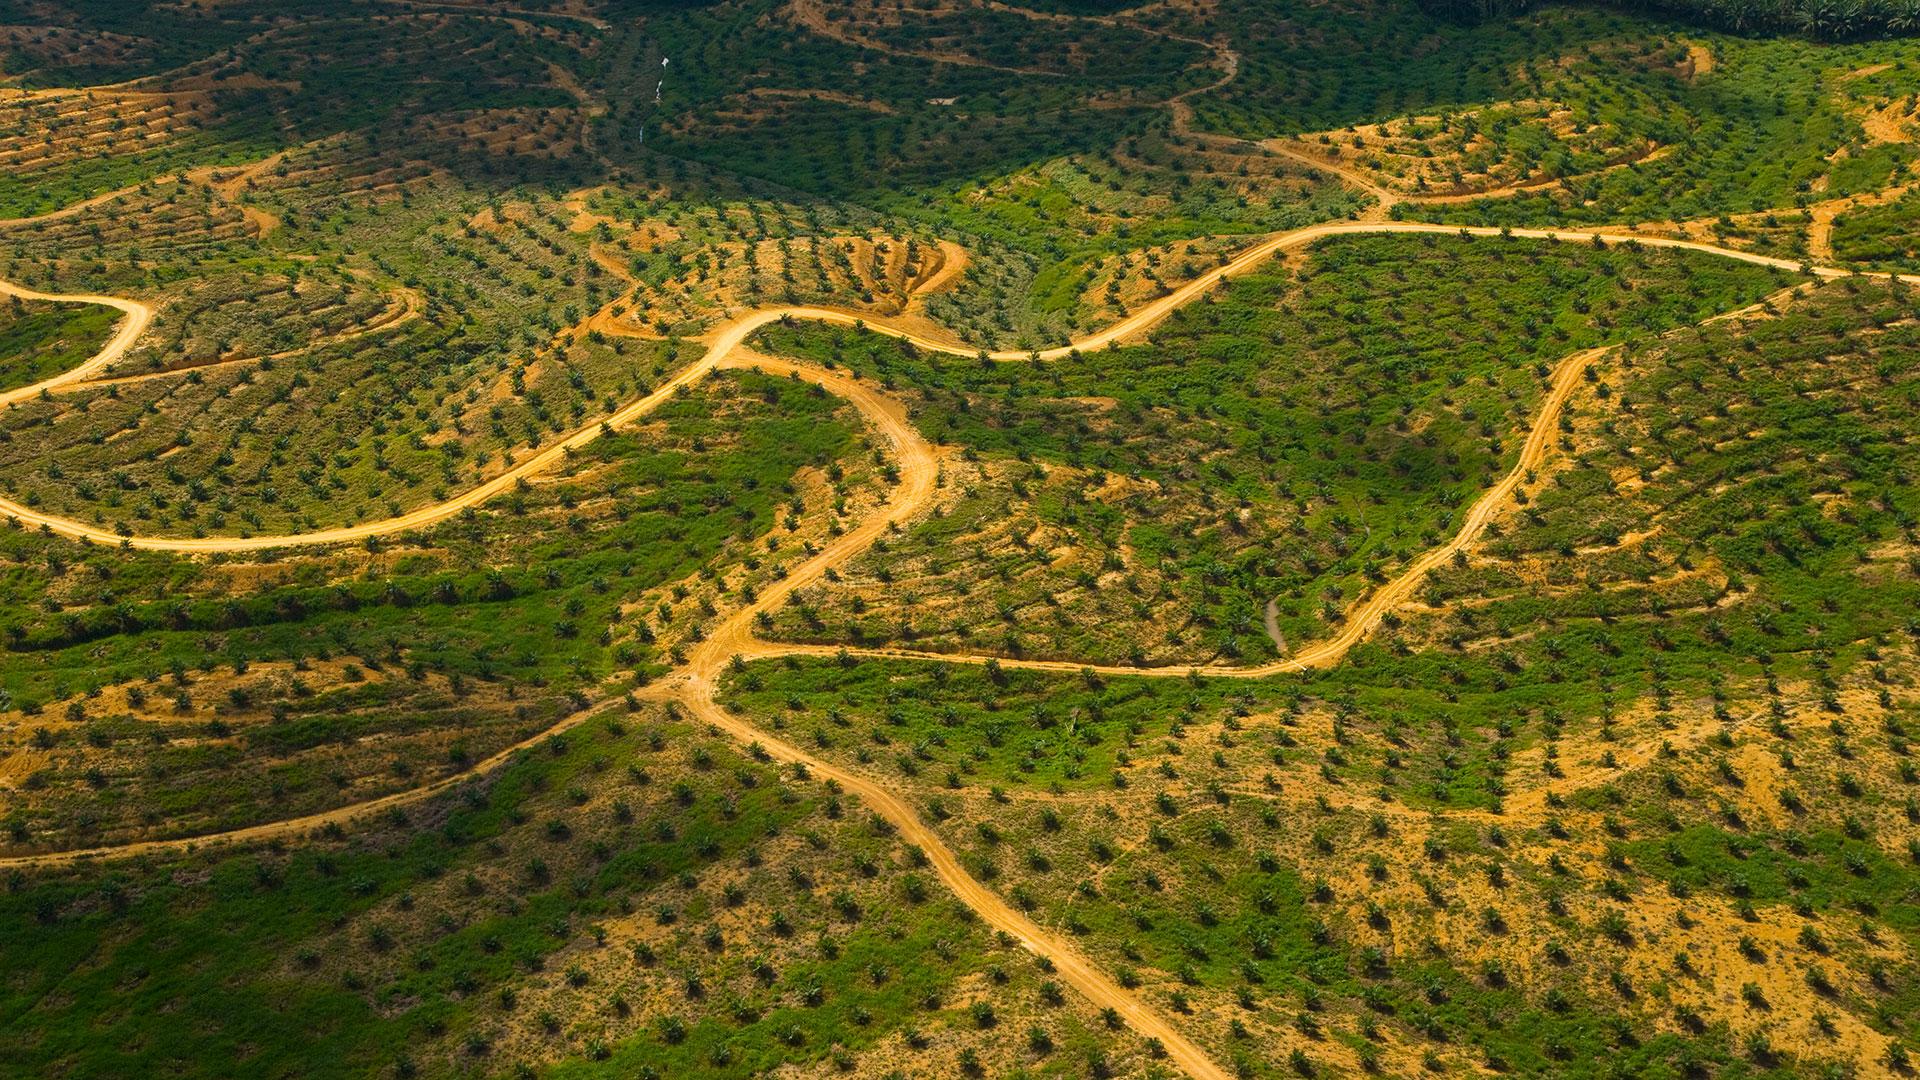 Palmöl Plantage Luftbild